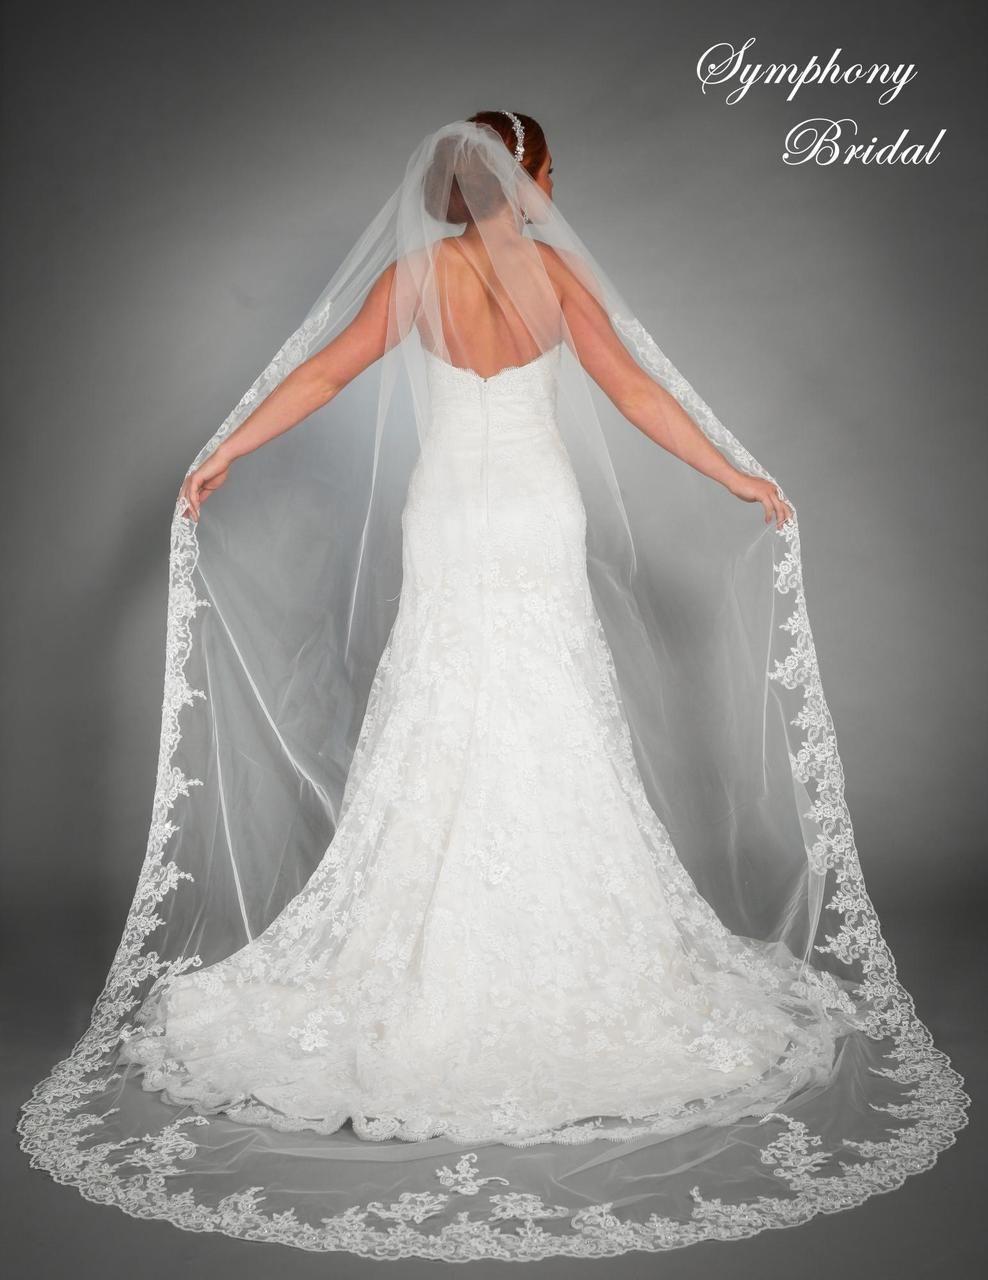 Lace Cathedral Length Wedding Veil 6442VL By Symphony Bridal